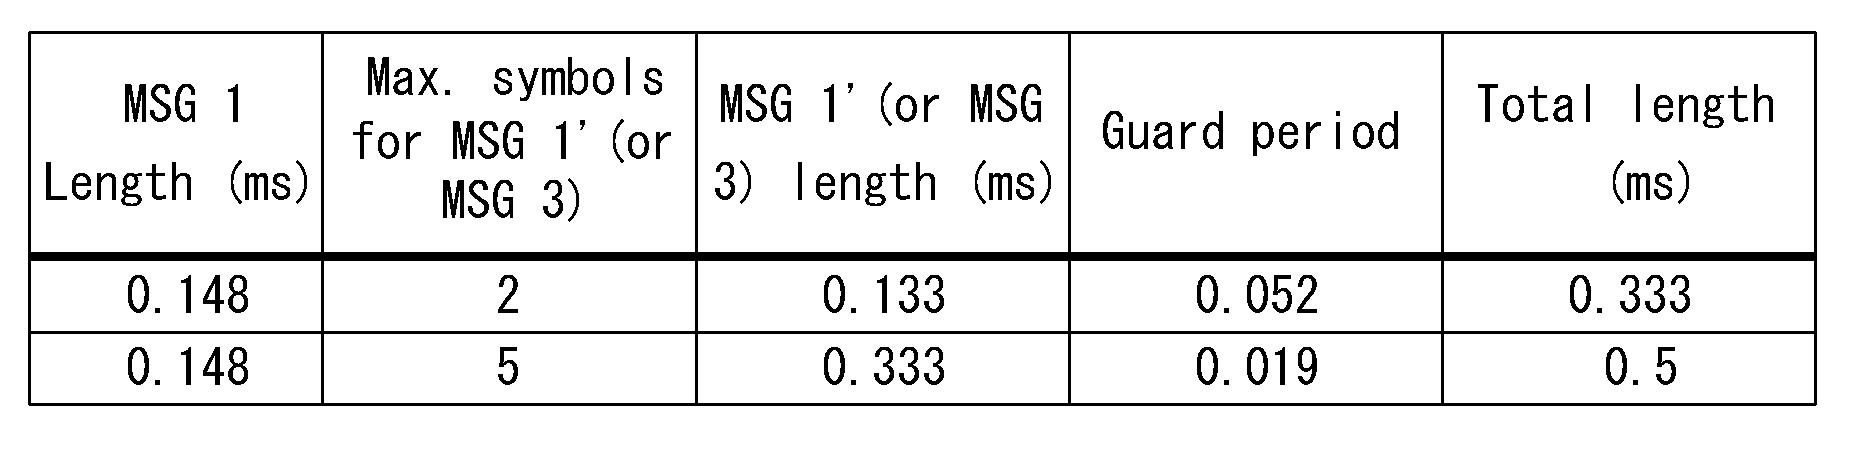 Wo2017030412a1 Random Access Procedure Performing Method In Msg 3 Logic Diagram Figure Pctkr2016009168 Appb T000020